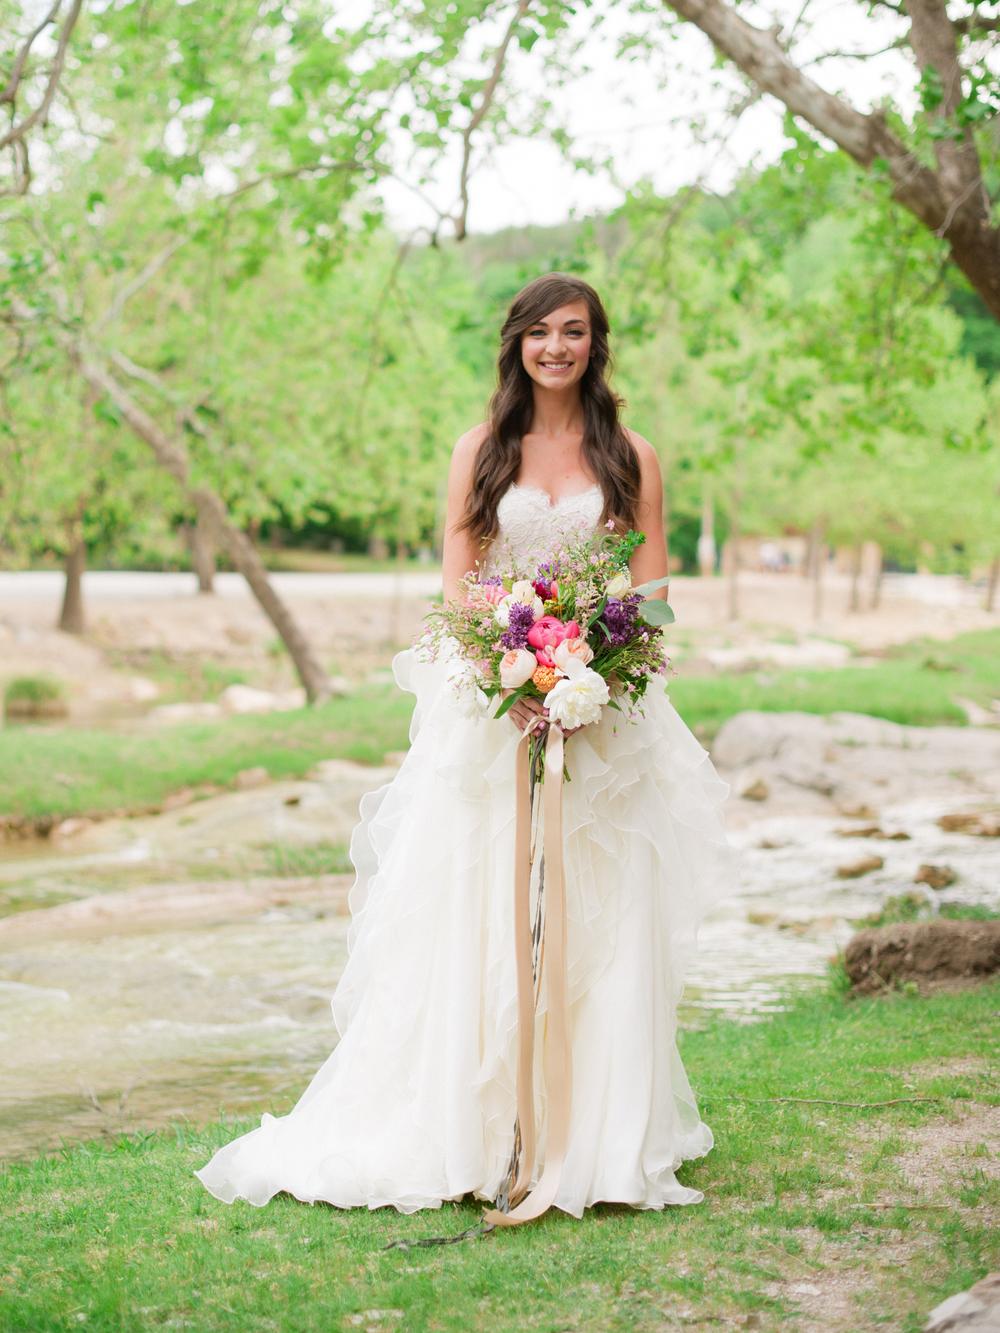 Jayme-bridals0001.jpg